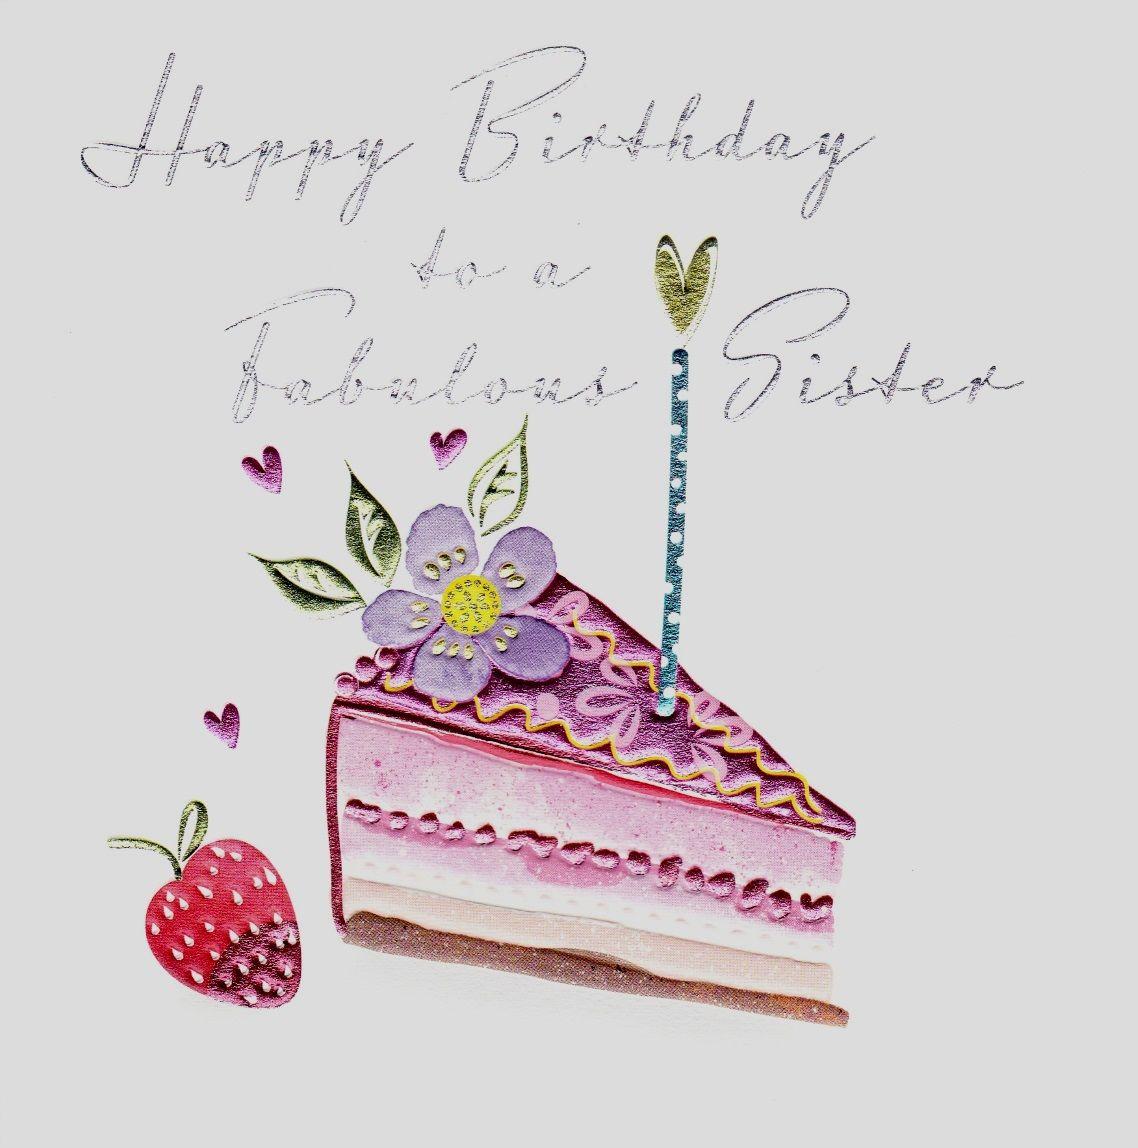 Fabulous Sister Slice Of Birthday Cake Birthday Card Karenza Paperie